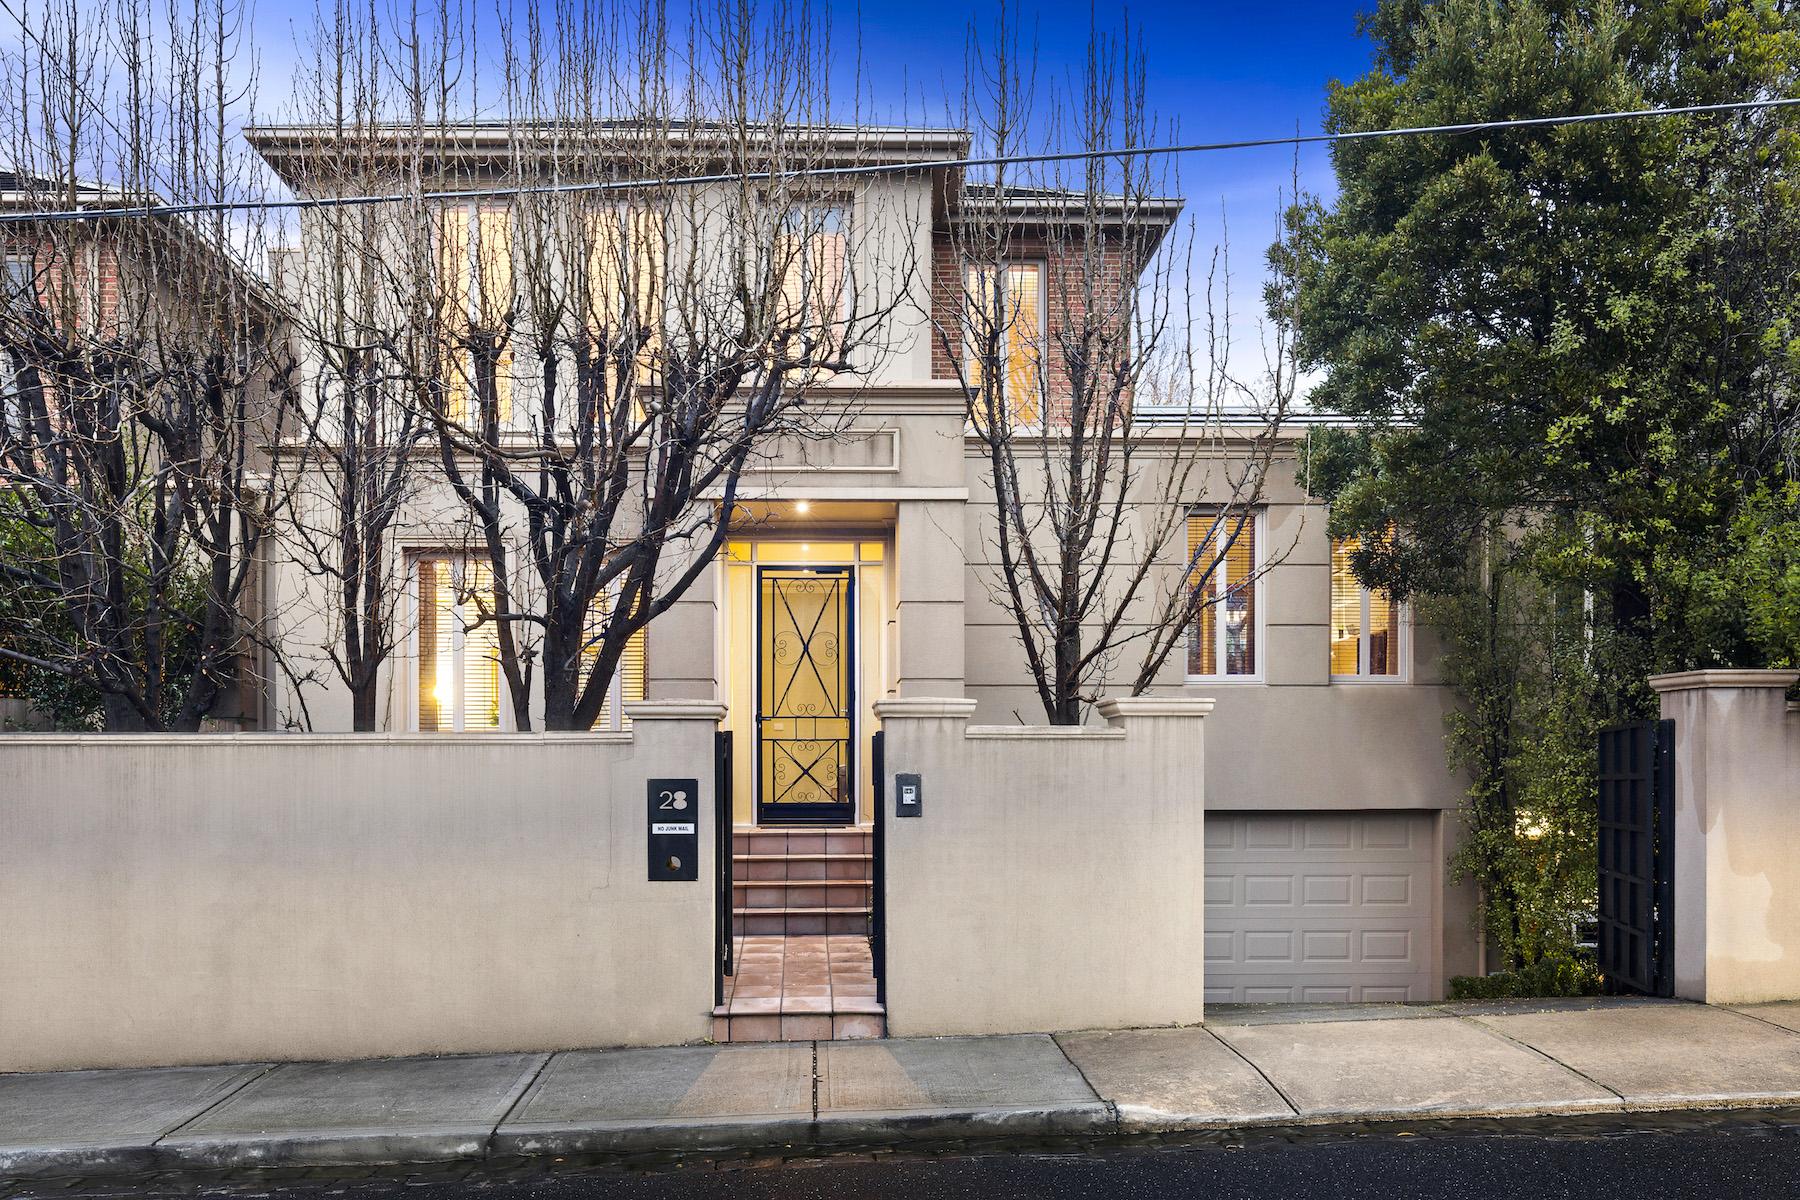 Casa Unifamiliar por un Venta en 28 Church Street, Toorak Melbourne, Victoria, 3142 Australia